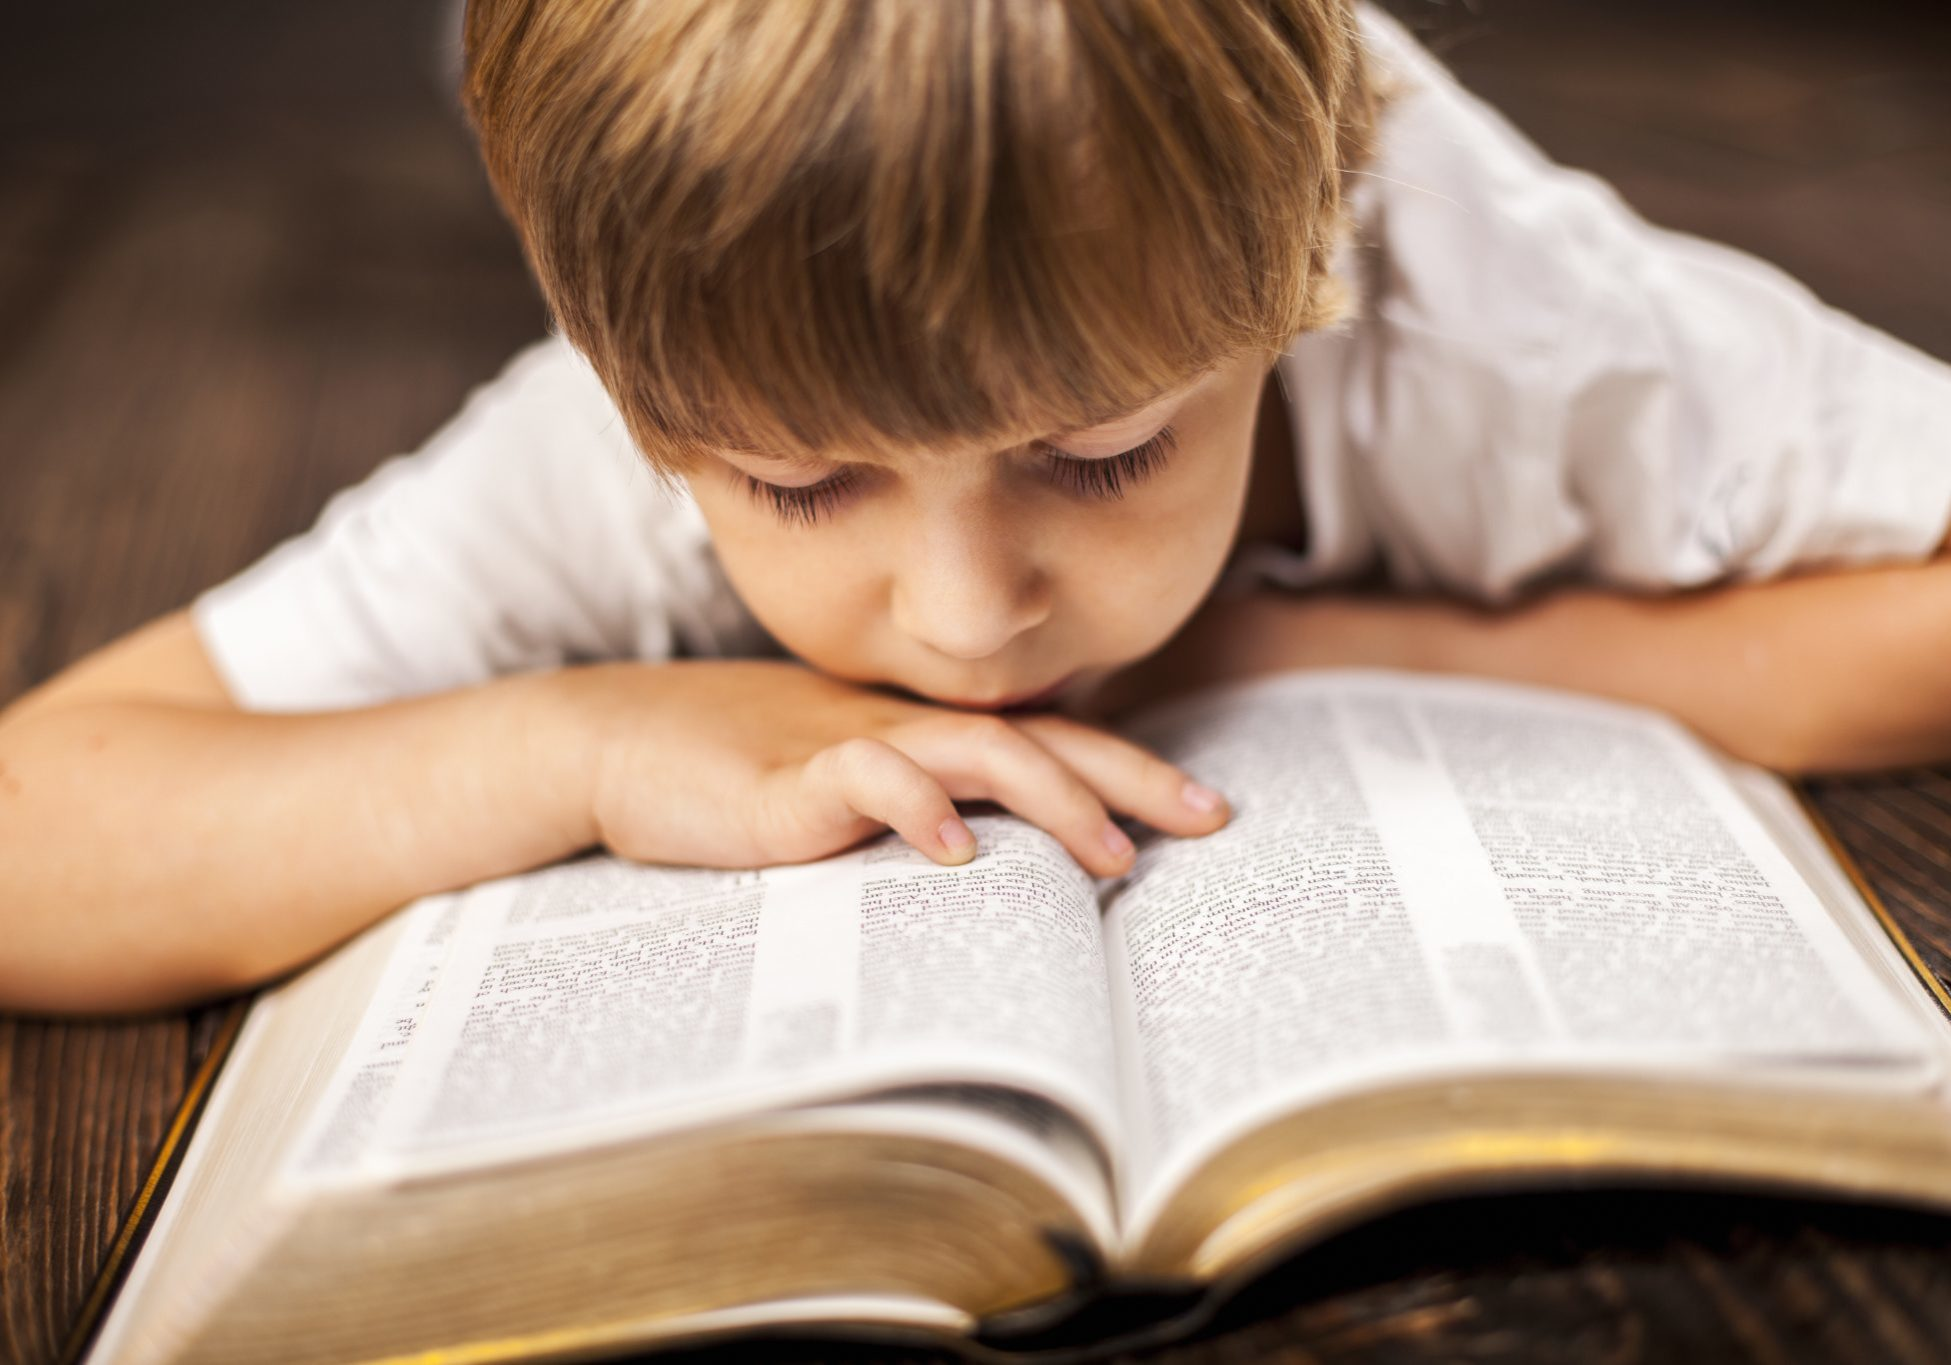 bigstock-little-boy-studying-the-script-80780252